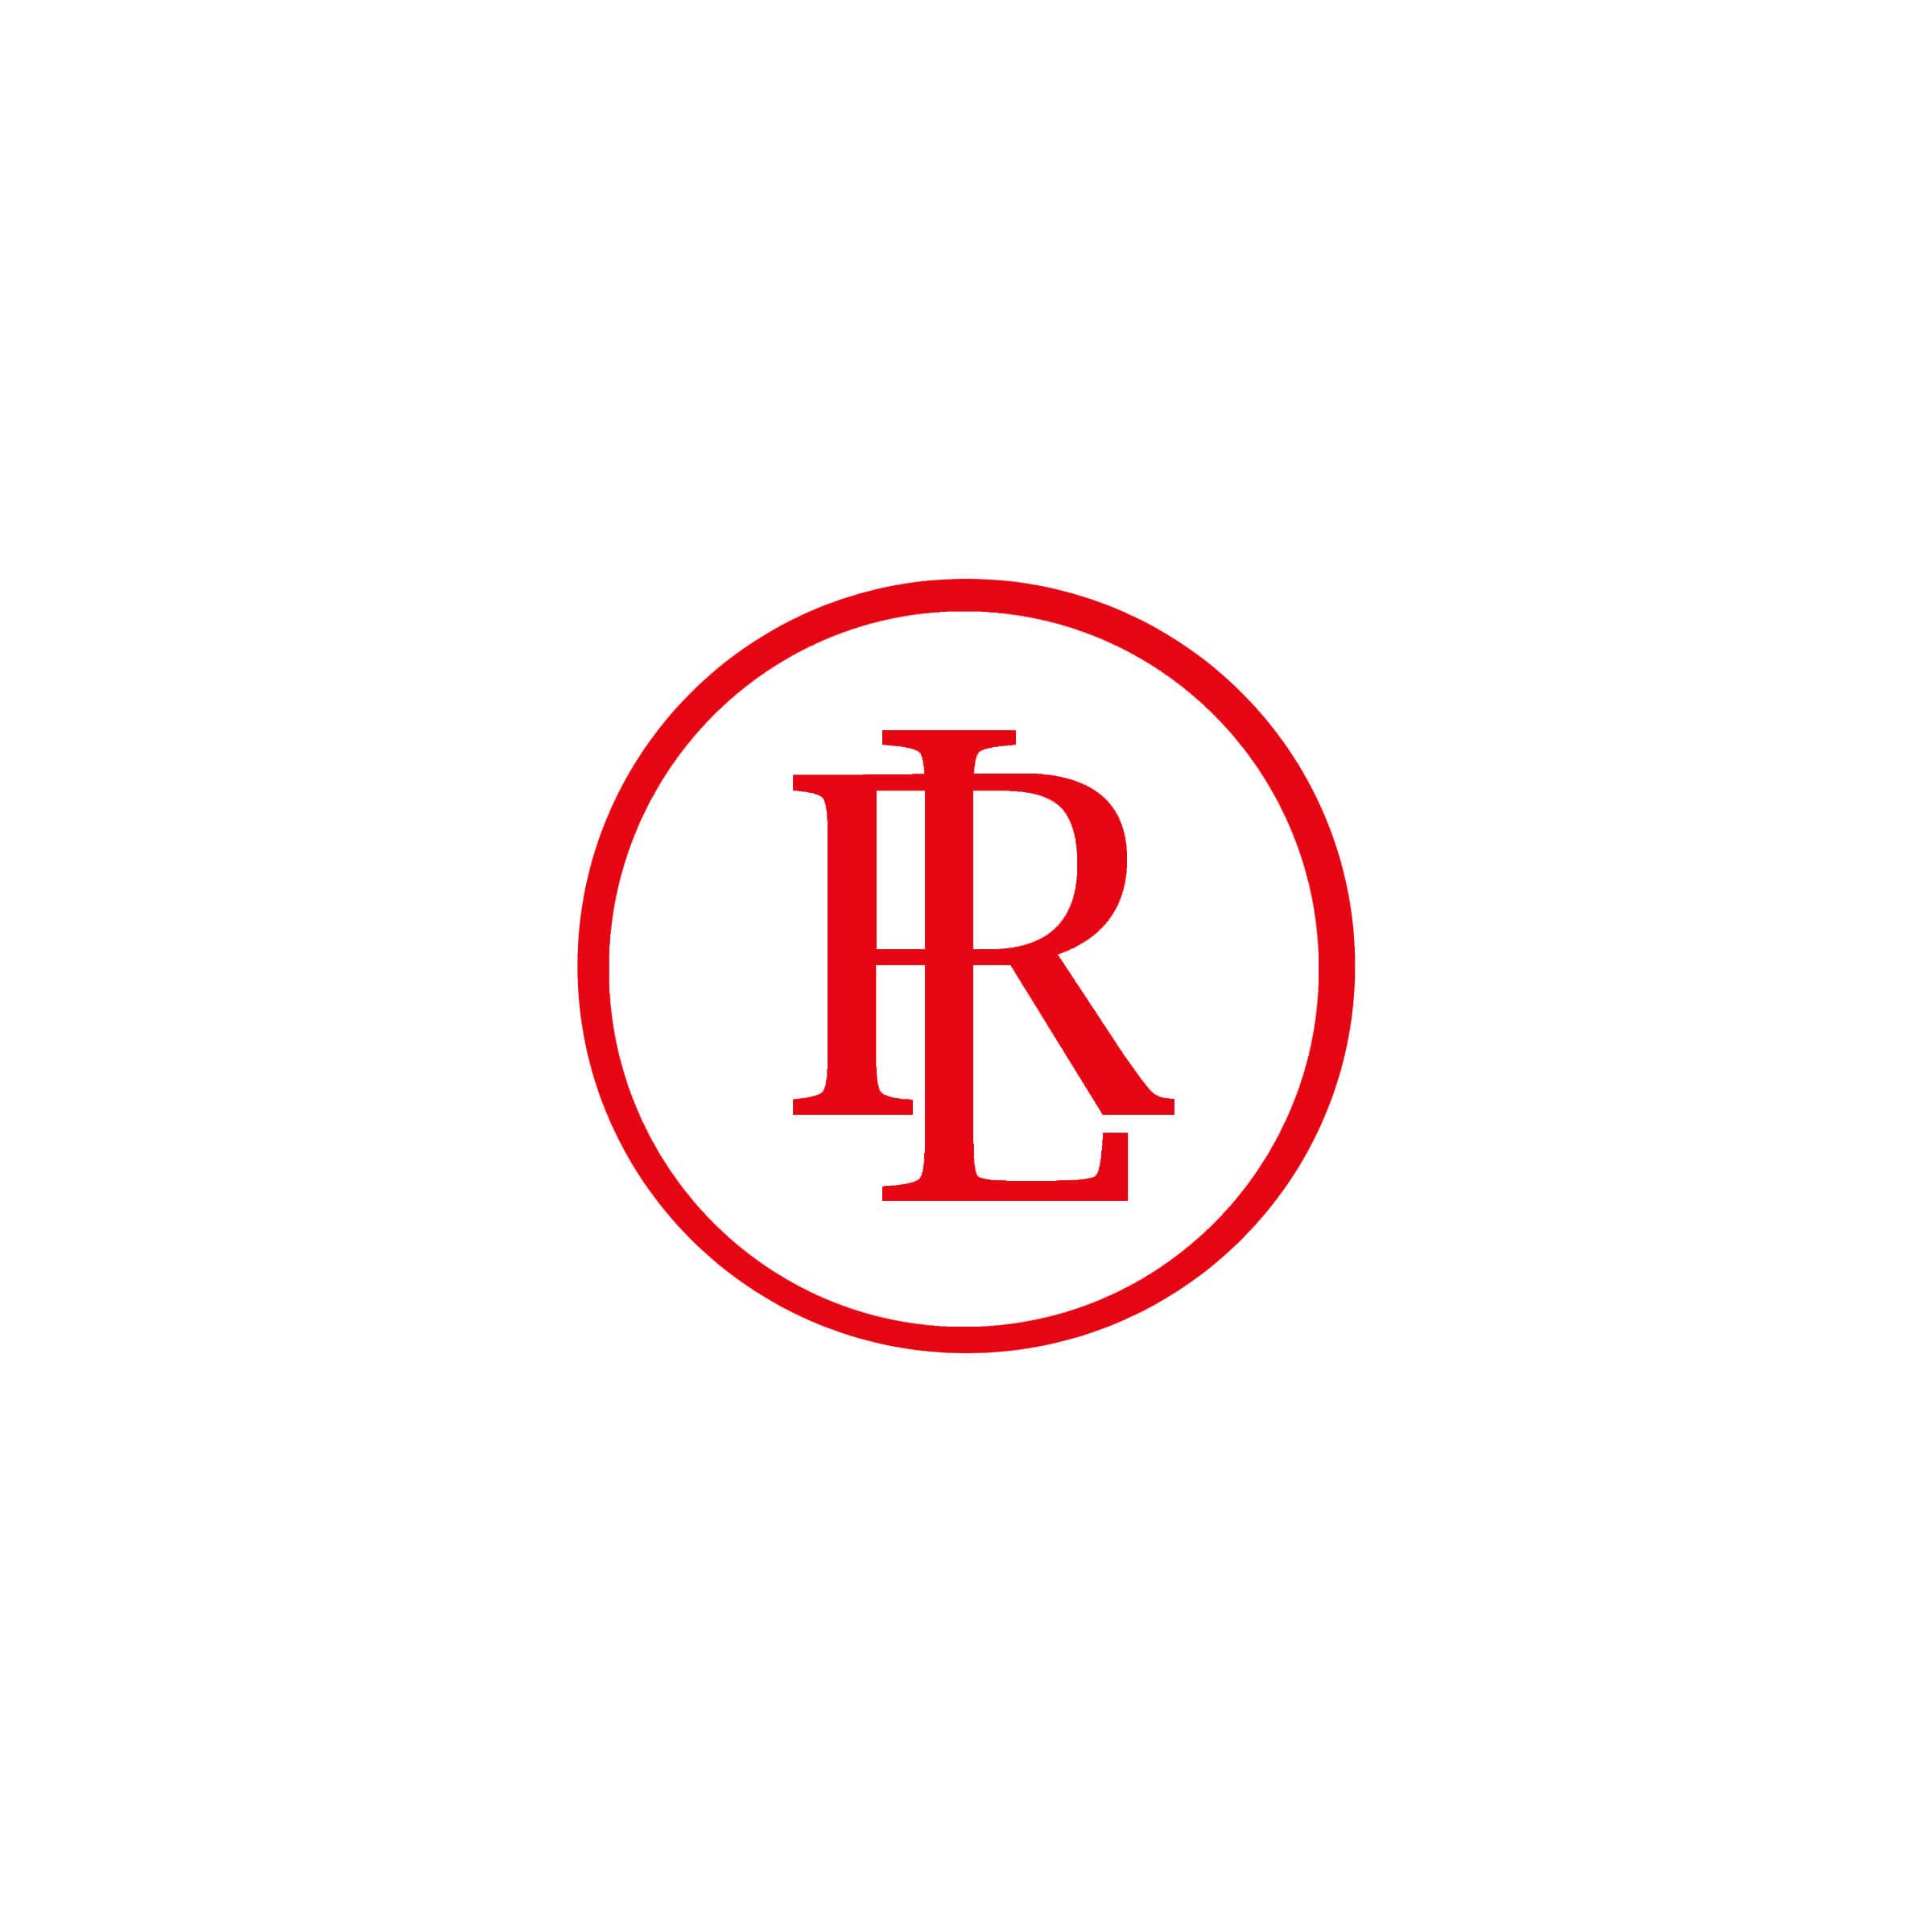 W203 4/02- (C180 kompressor / C200 kompressor / C230 kompressor ) W209 -11/05 (CLK200 kompressor) ka